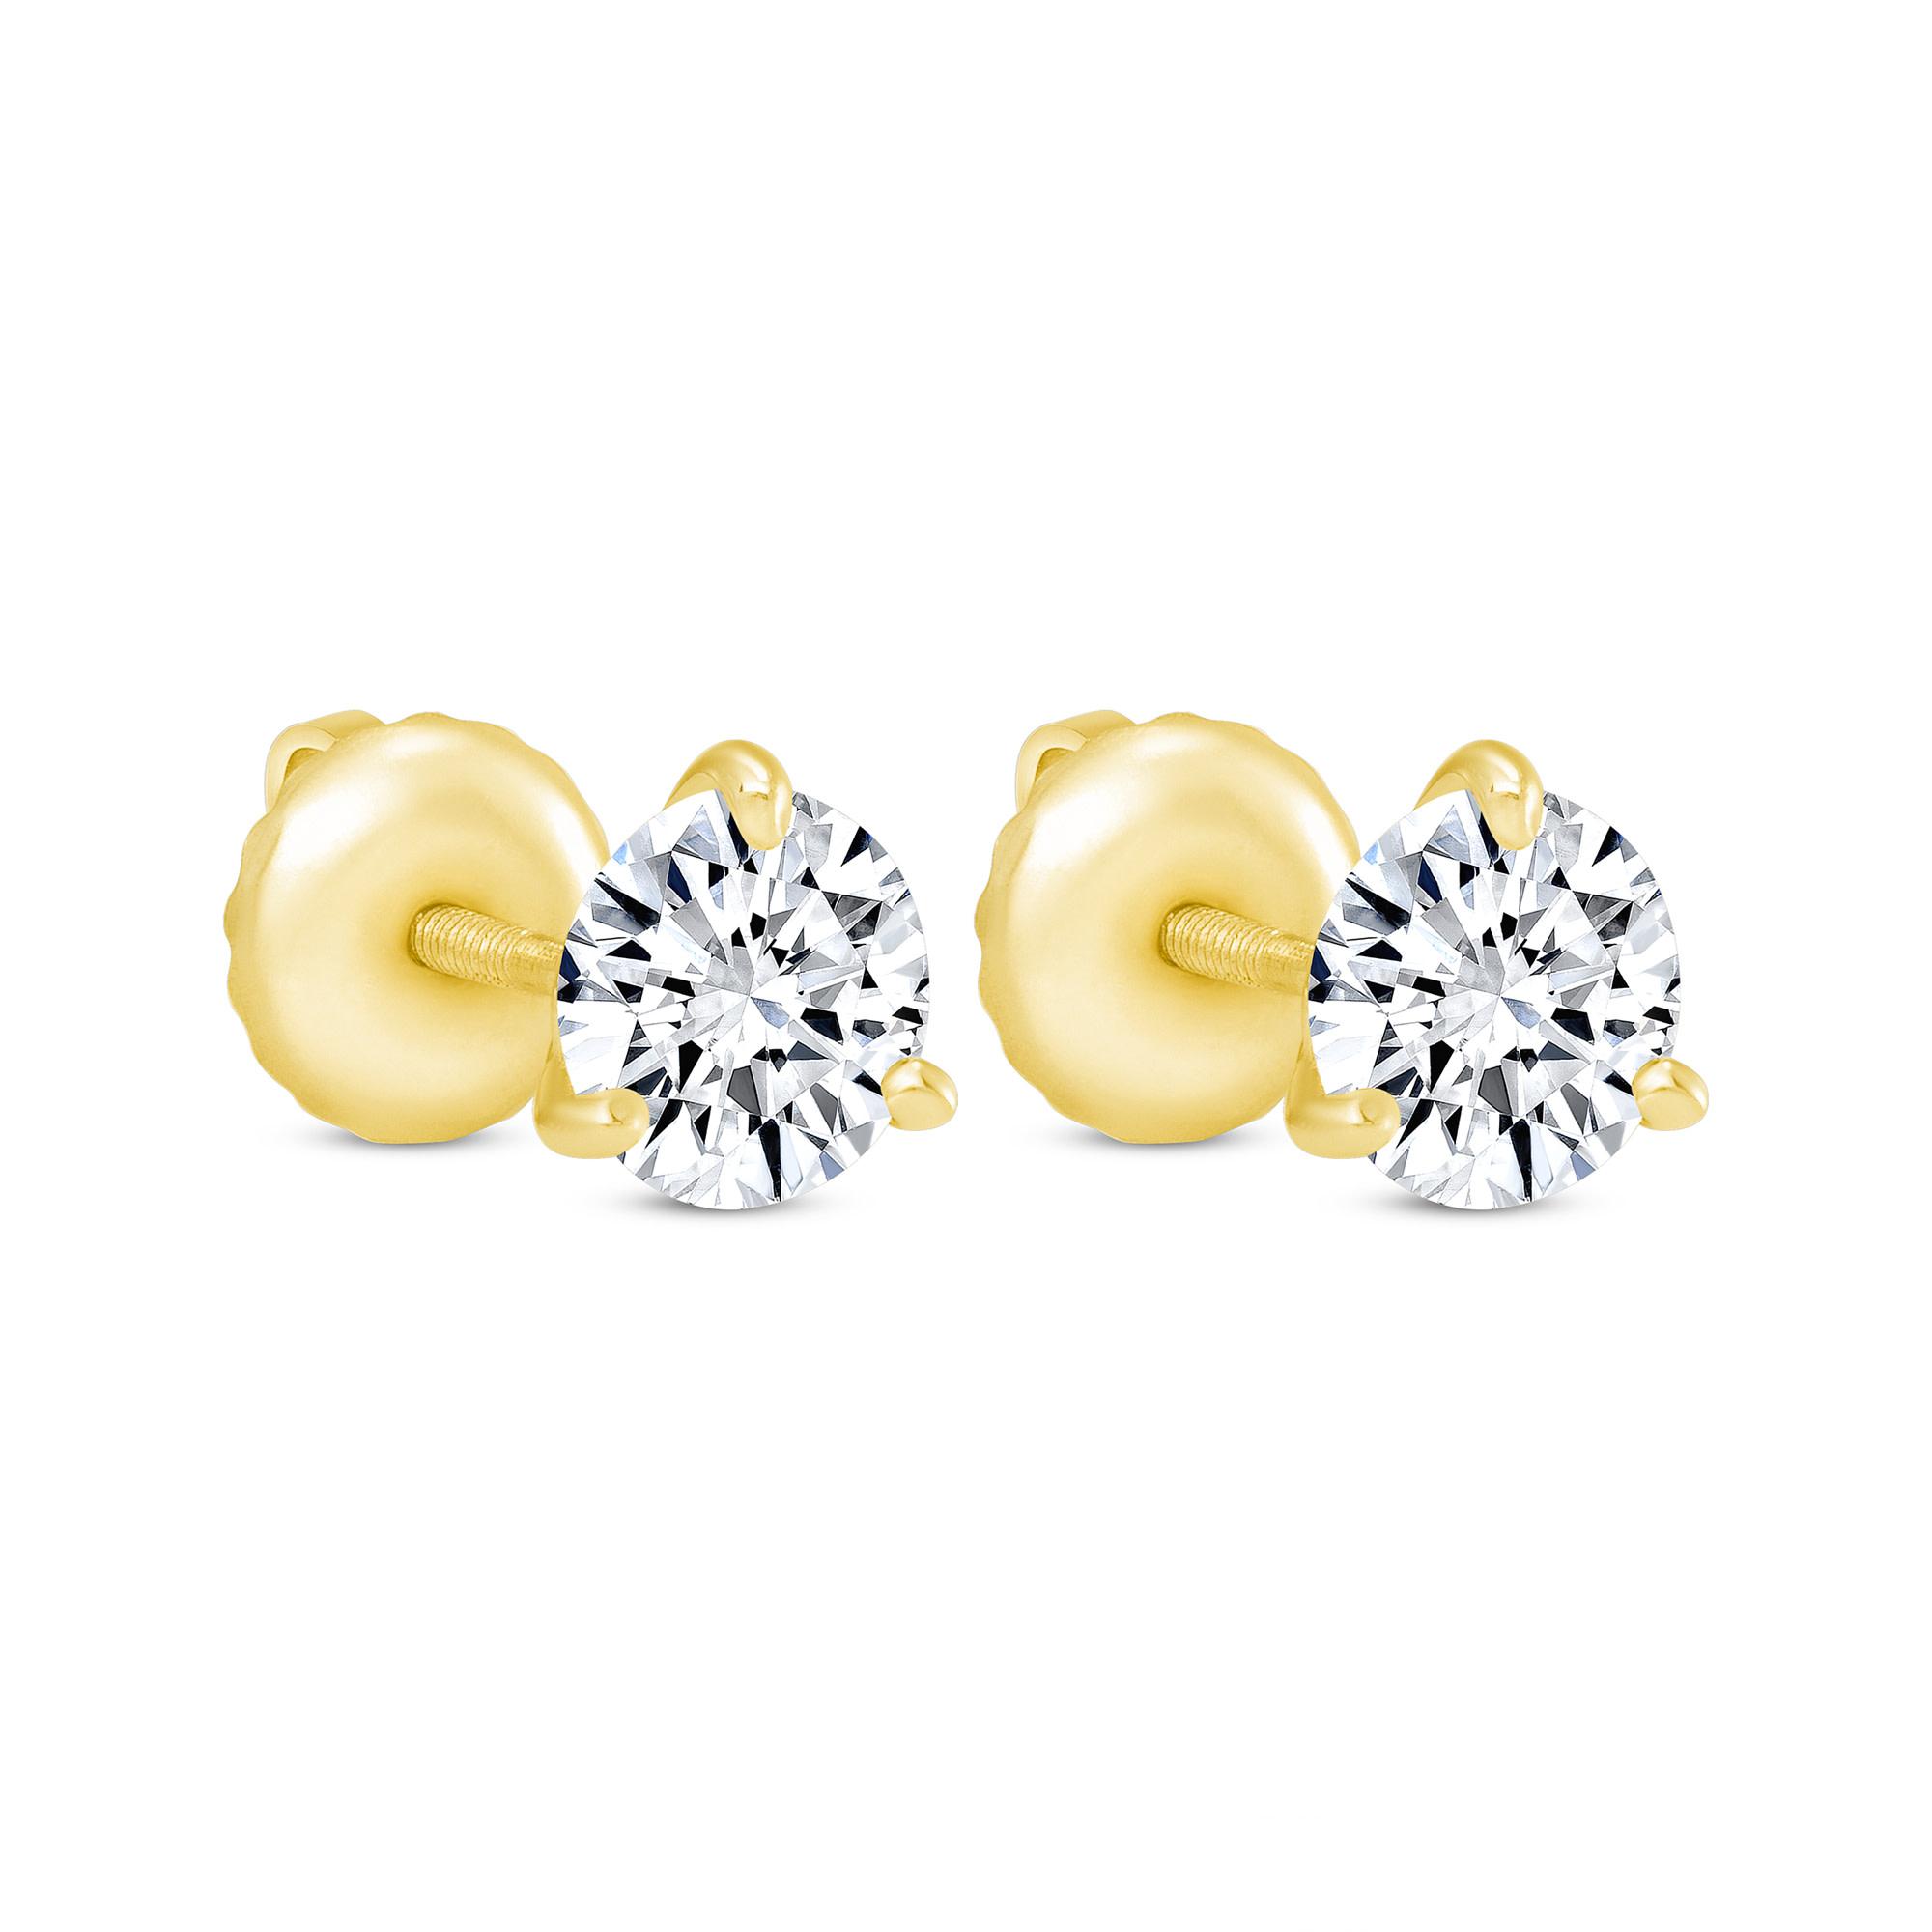 1.5 carat total weight diamond earrings   1.5 carat total weight diamond stud earrings